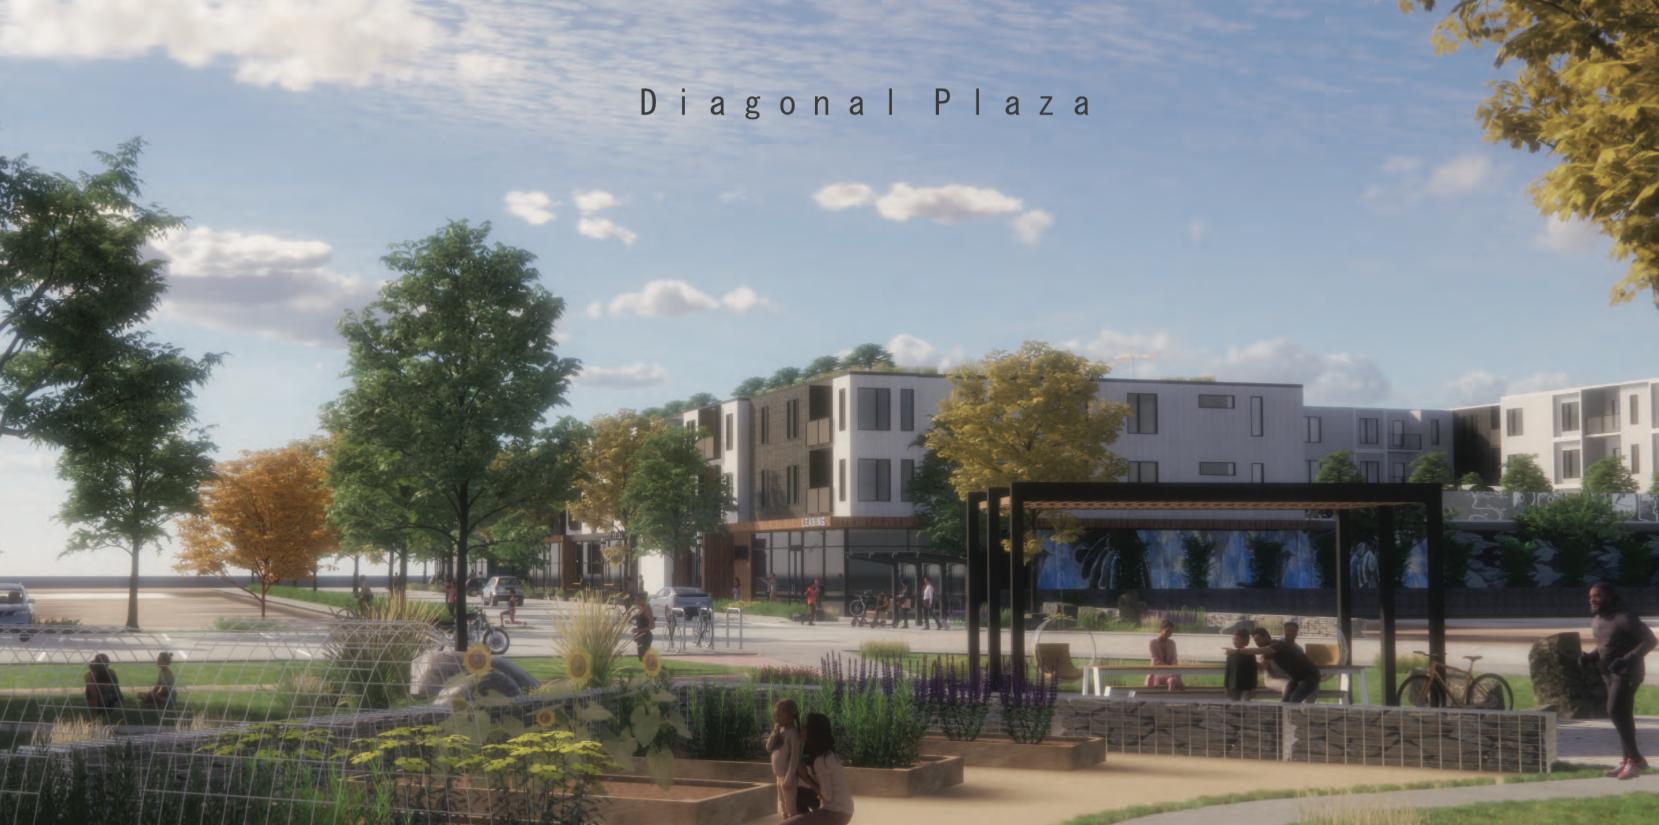 After decade of decline, (partial) plans for Boulder's Diagonal Plaza